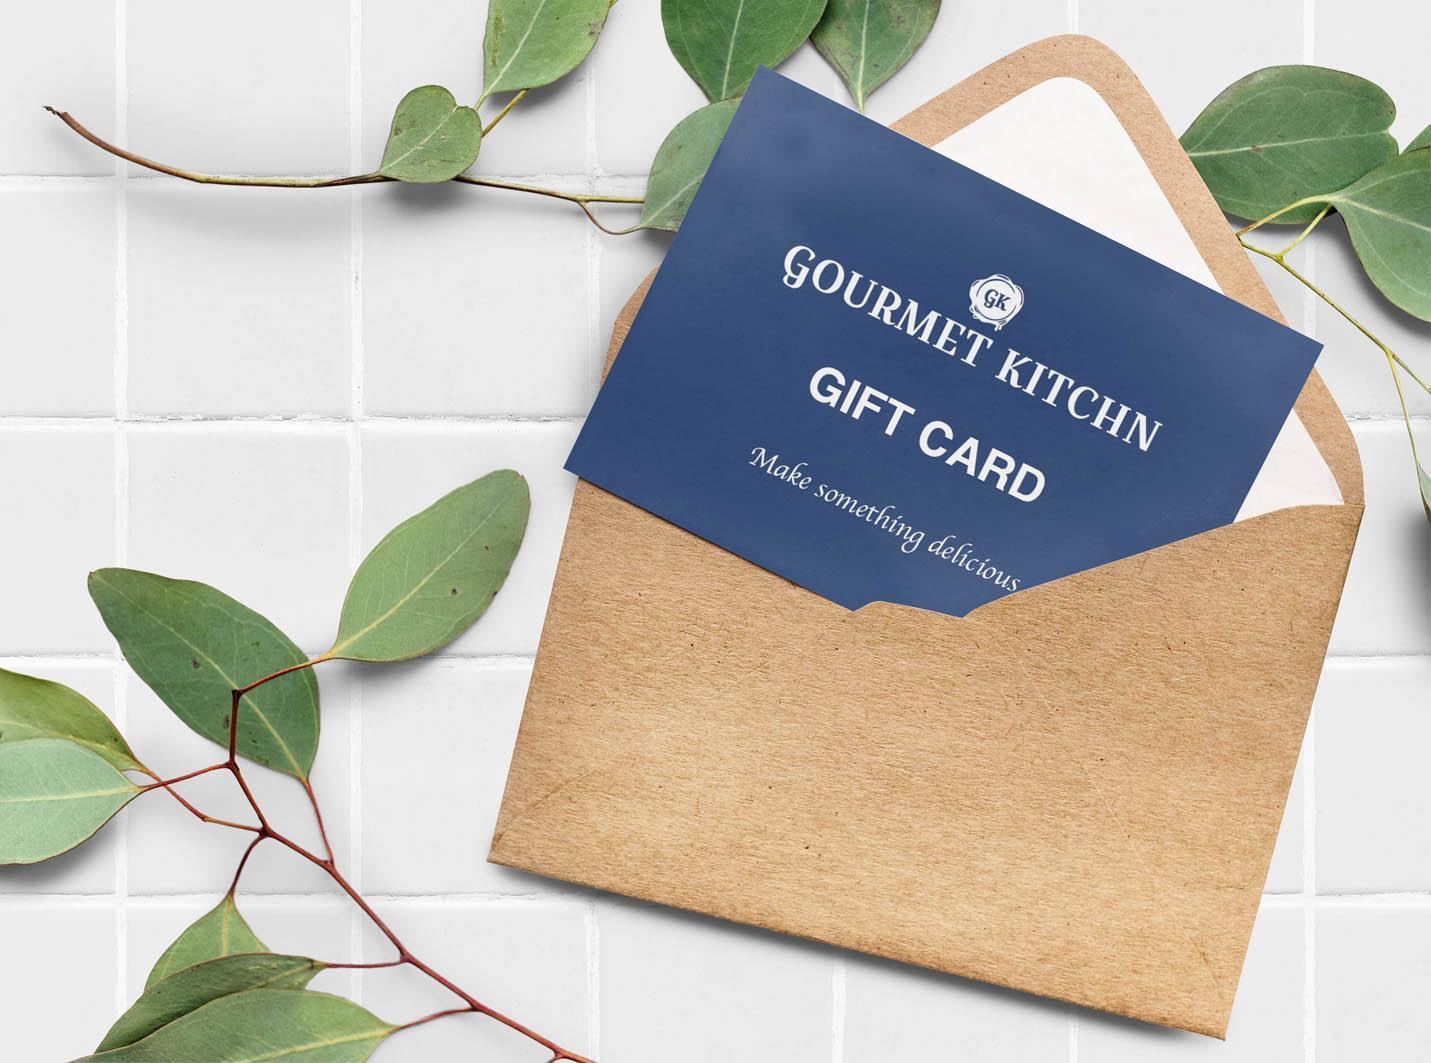 Gourmet Kitchn – Gift Card